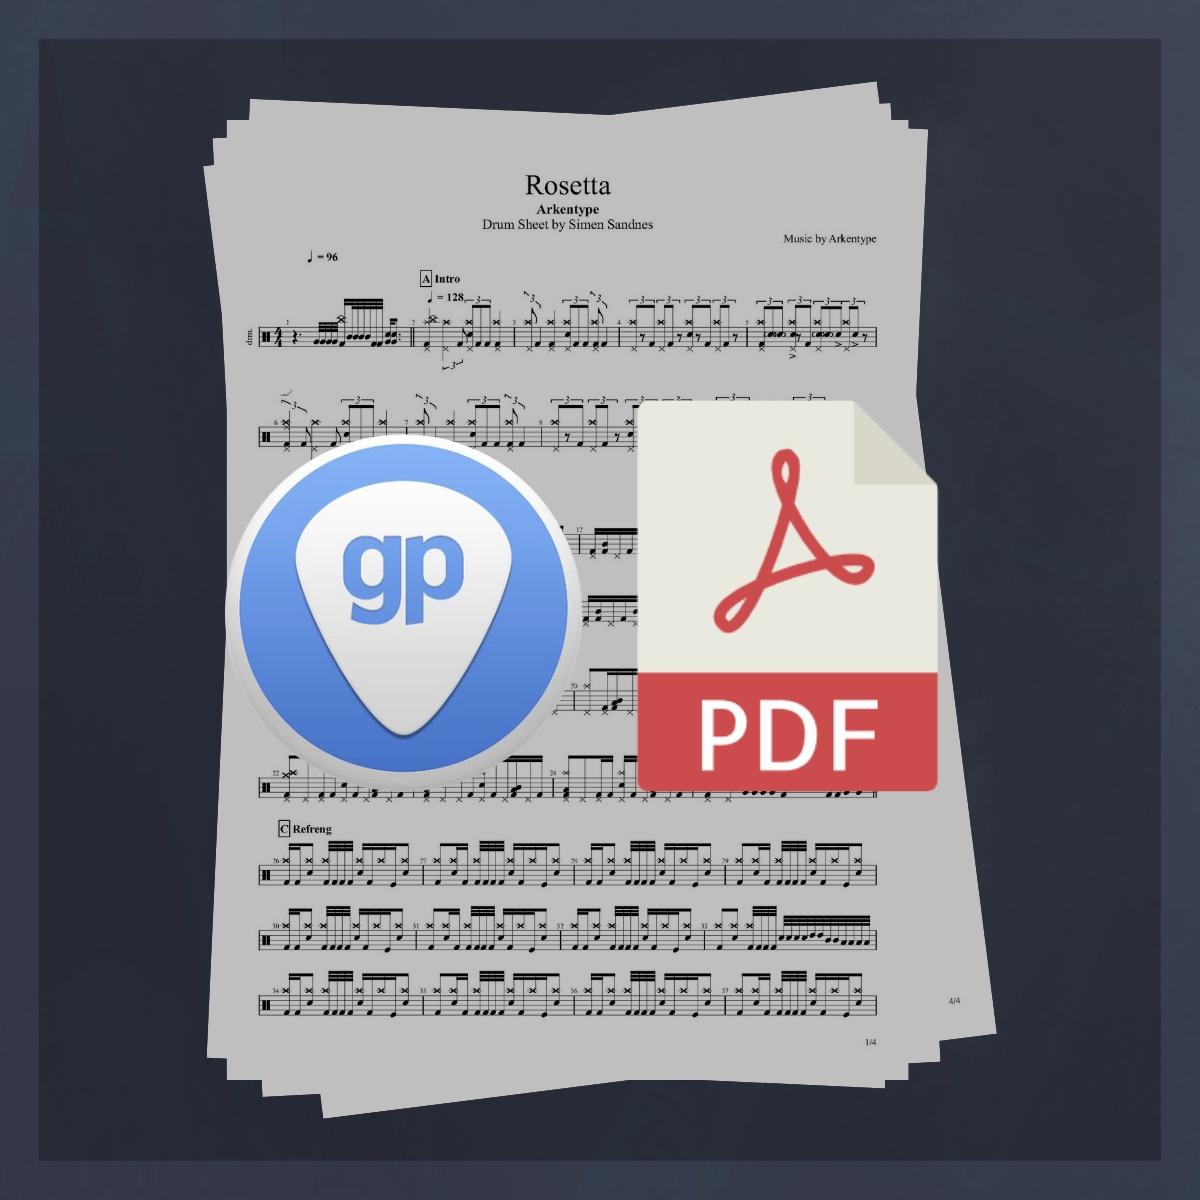 Arkentype Rosetta Drums Sheet Music